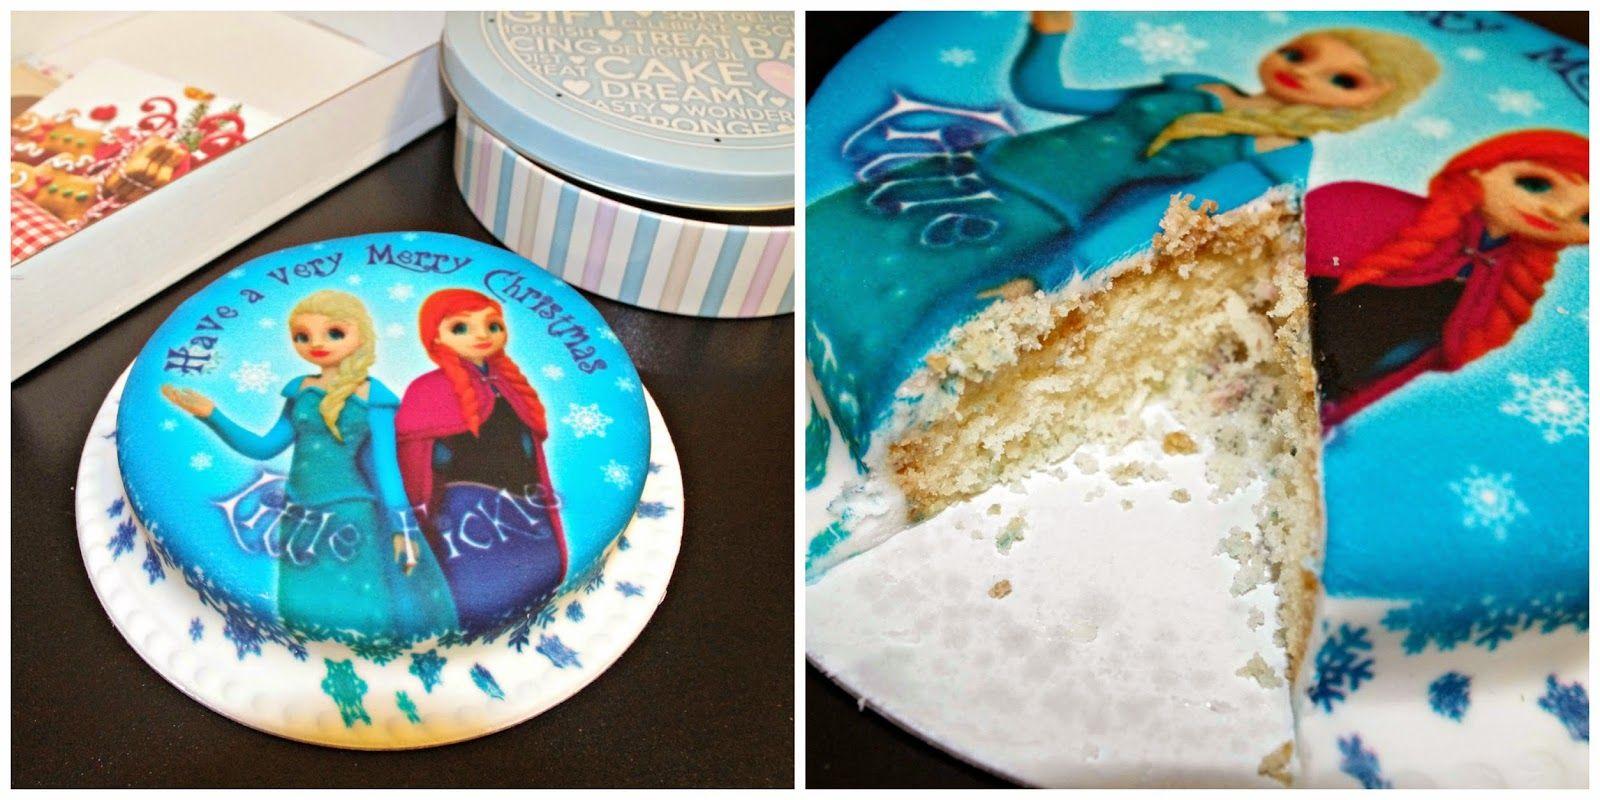 Little Fickle: Bakerdays Letterbox Cake*